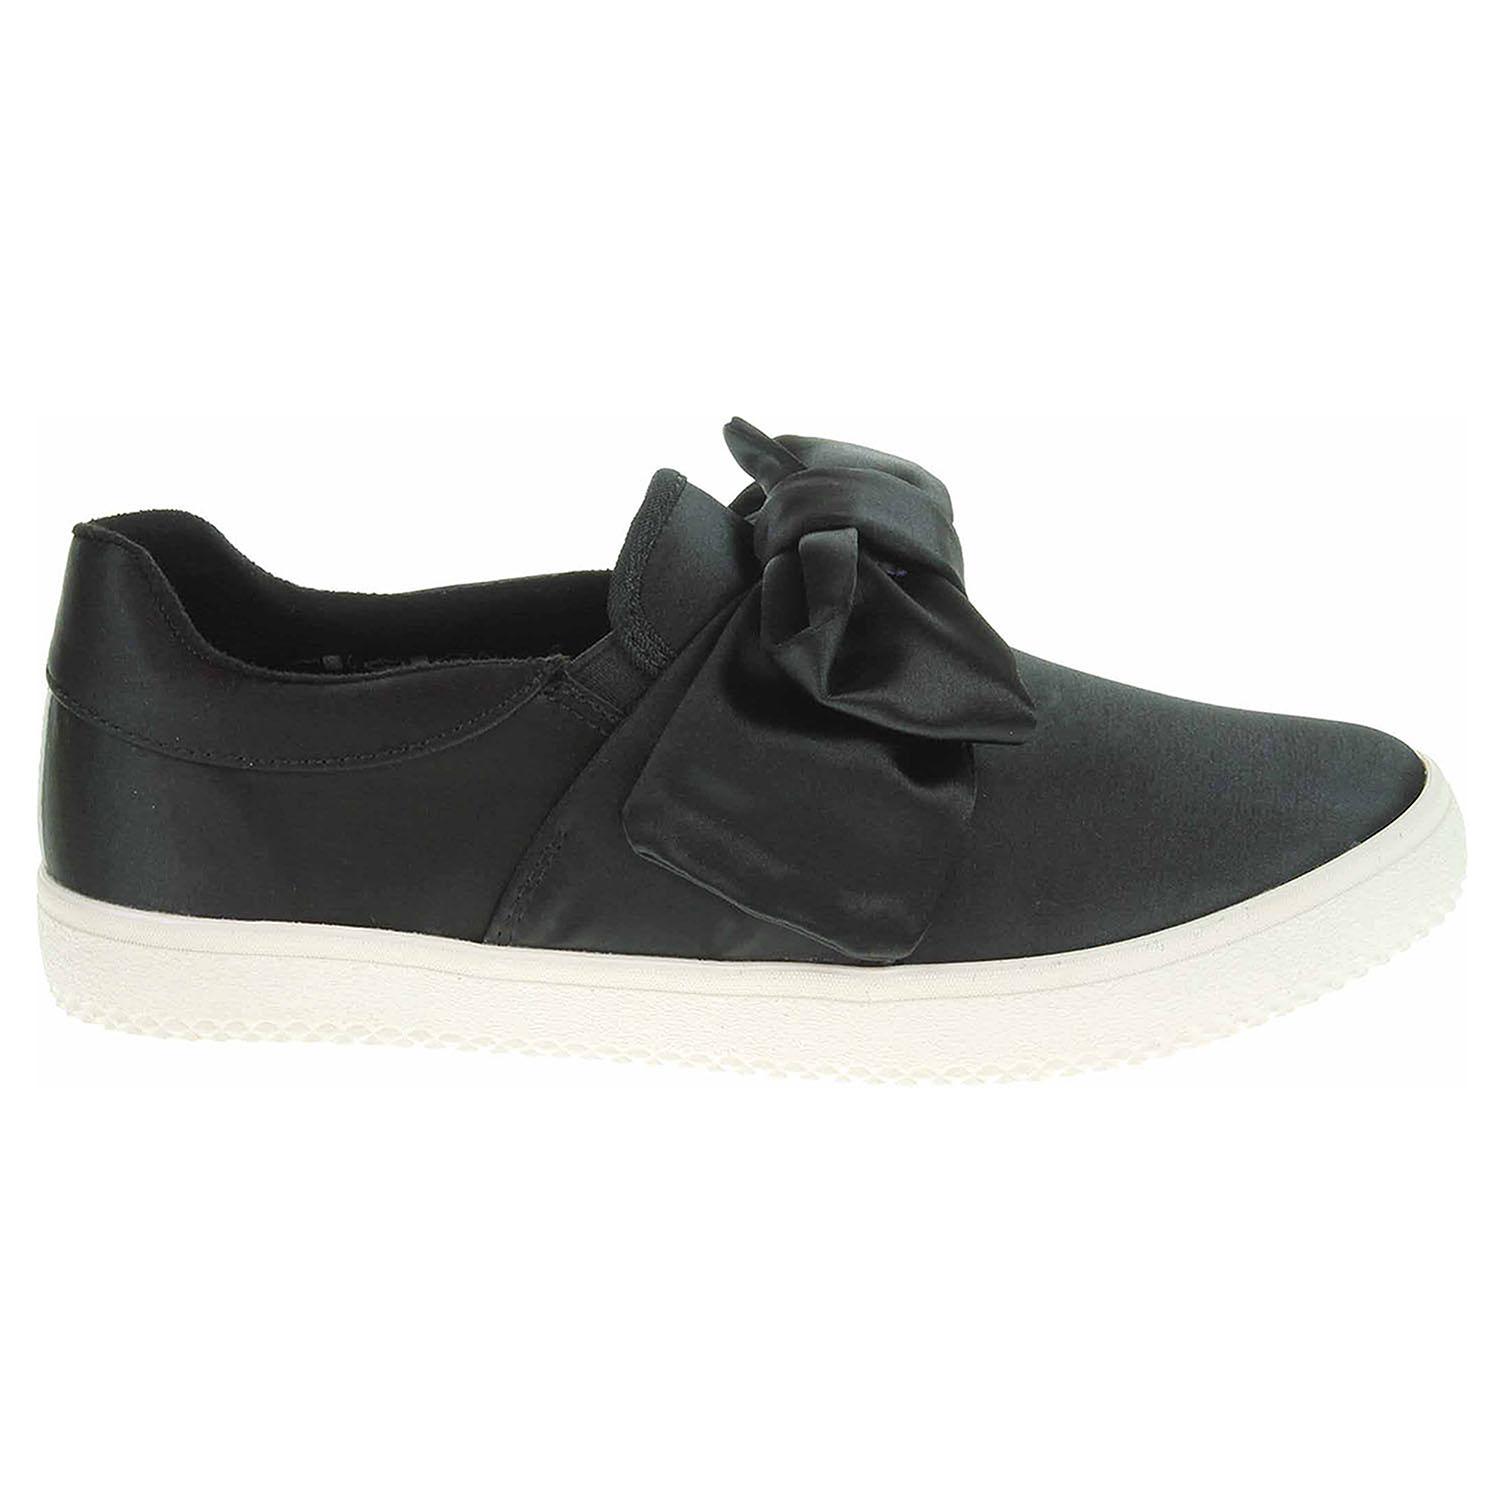 Oliver dámská obuv 5-24609-20 black 5-5-24609 9bf1361975